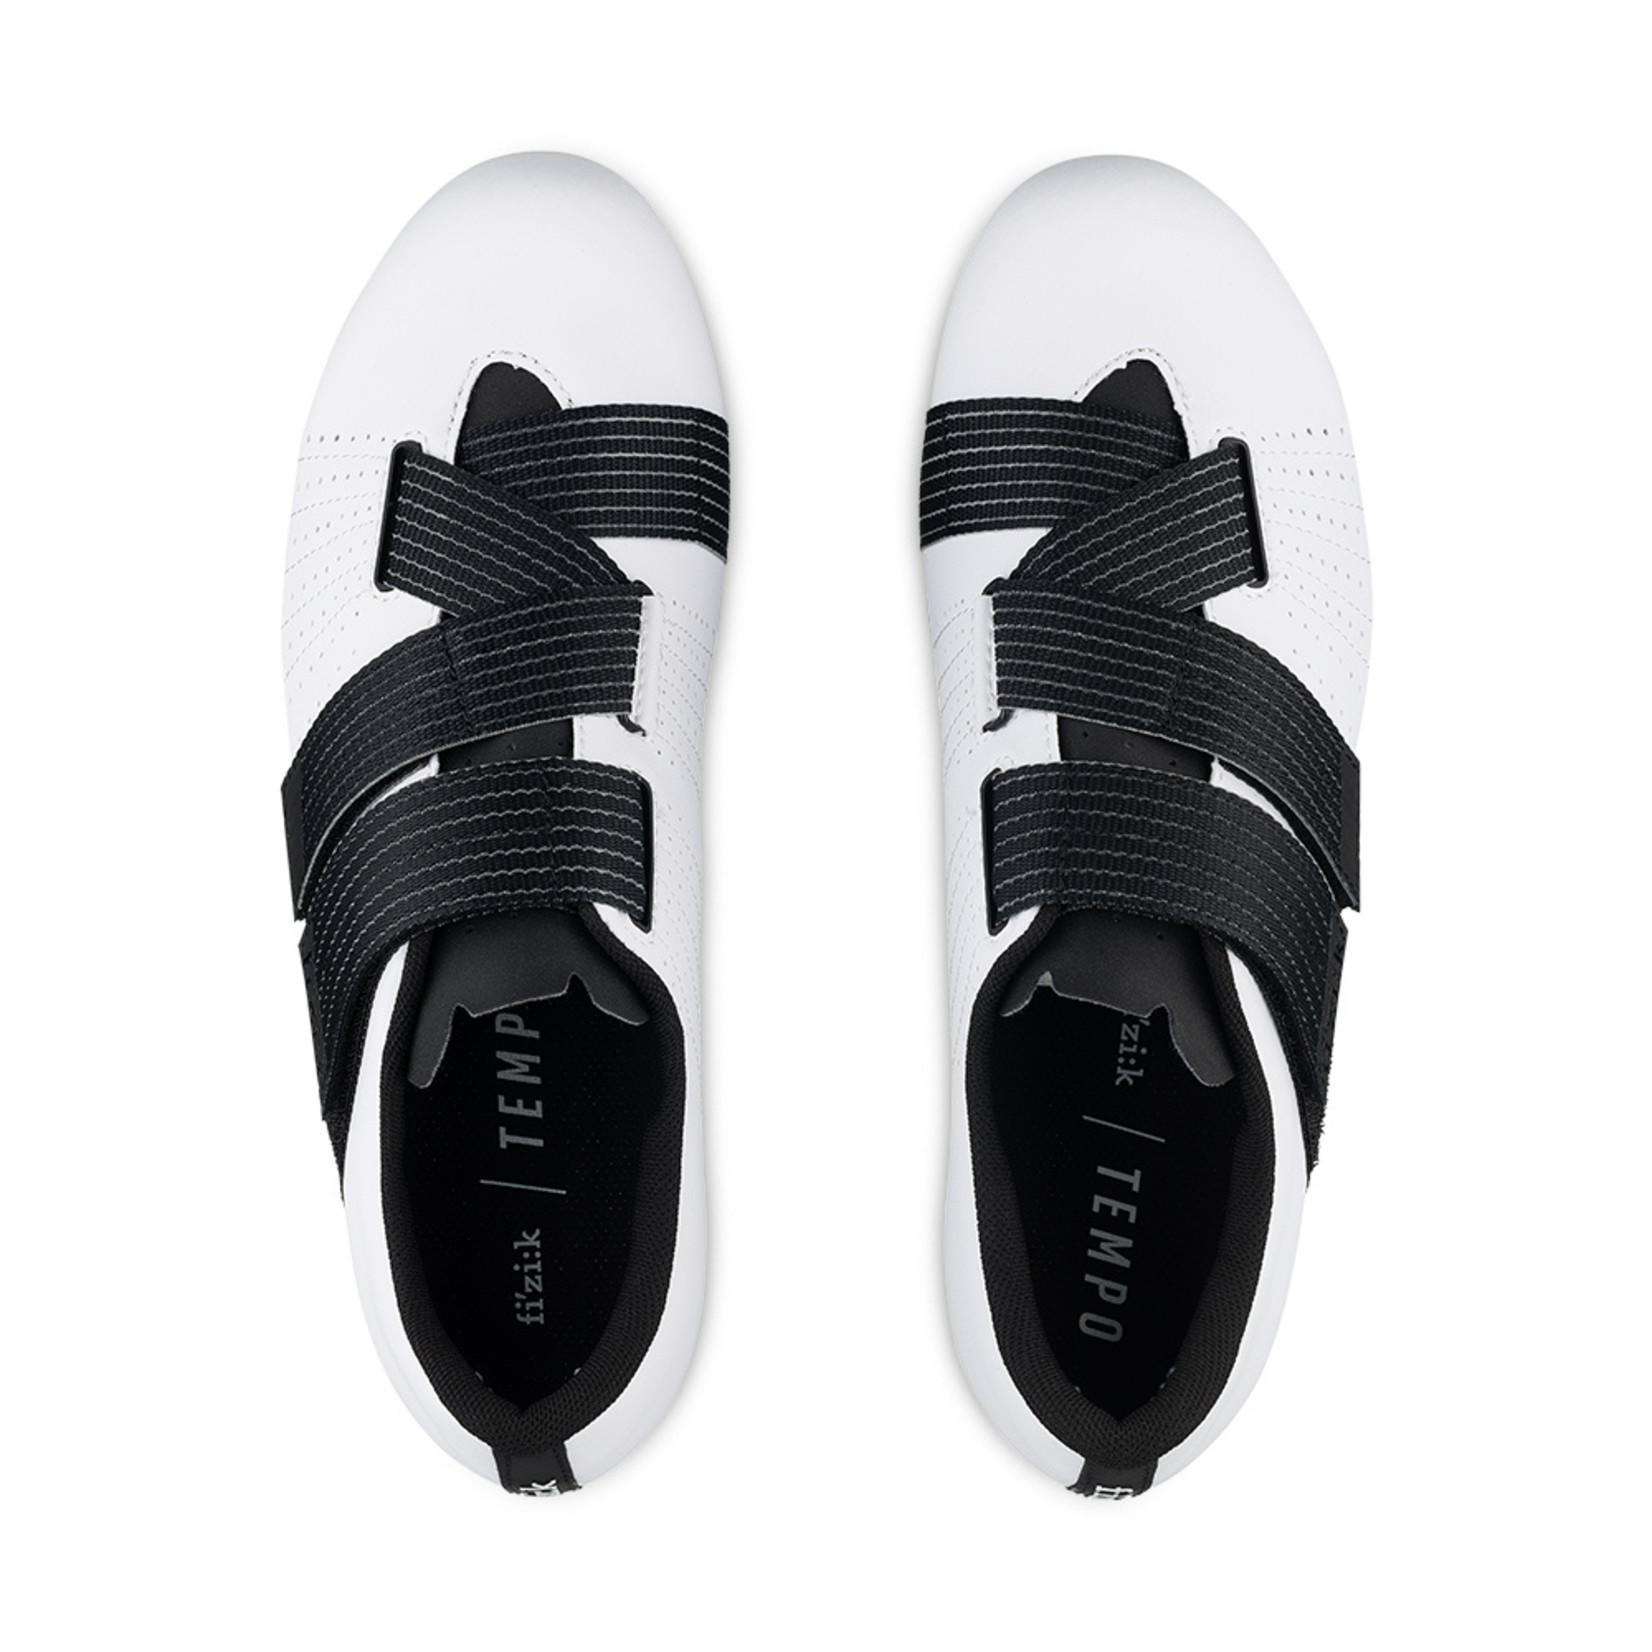 Fizik Tempo Powerstrap R5 Cycling Shoe